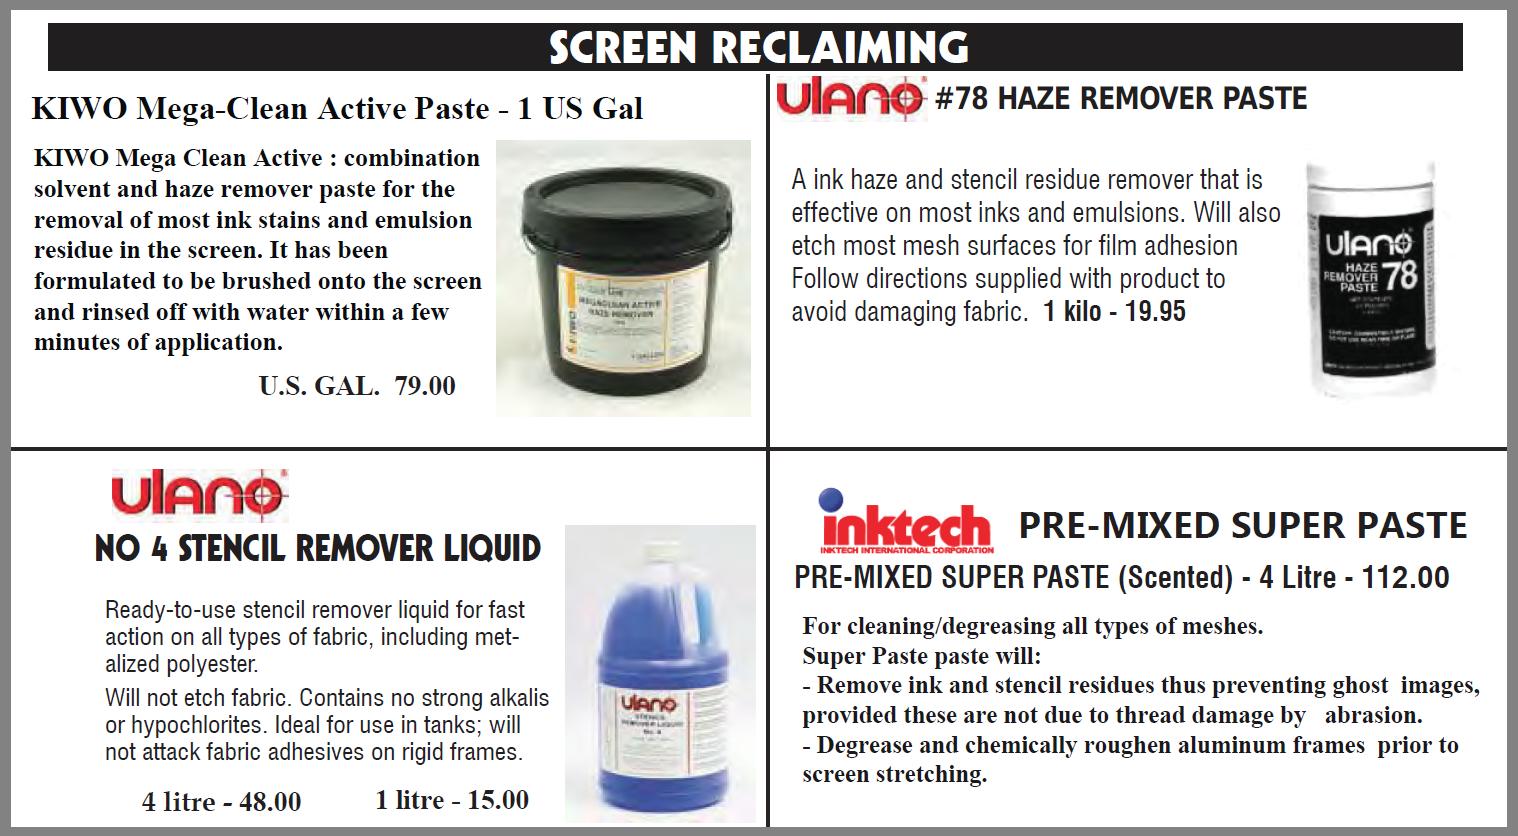 Emulsion remover 1 - Screen Emulsion and Stencil Removers